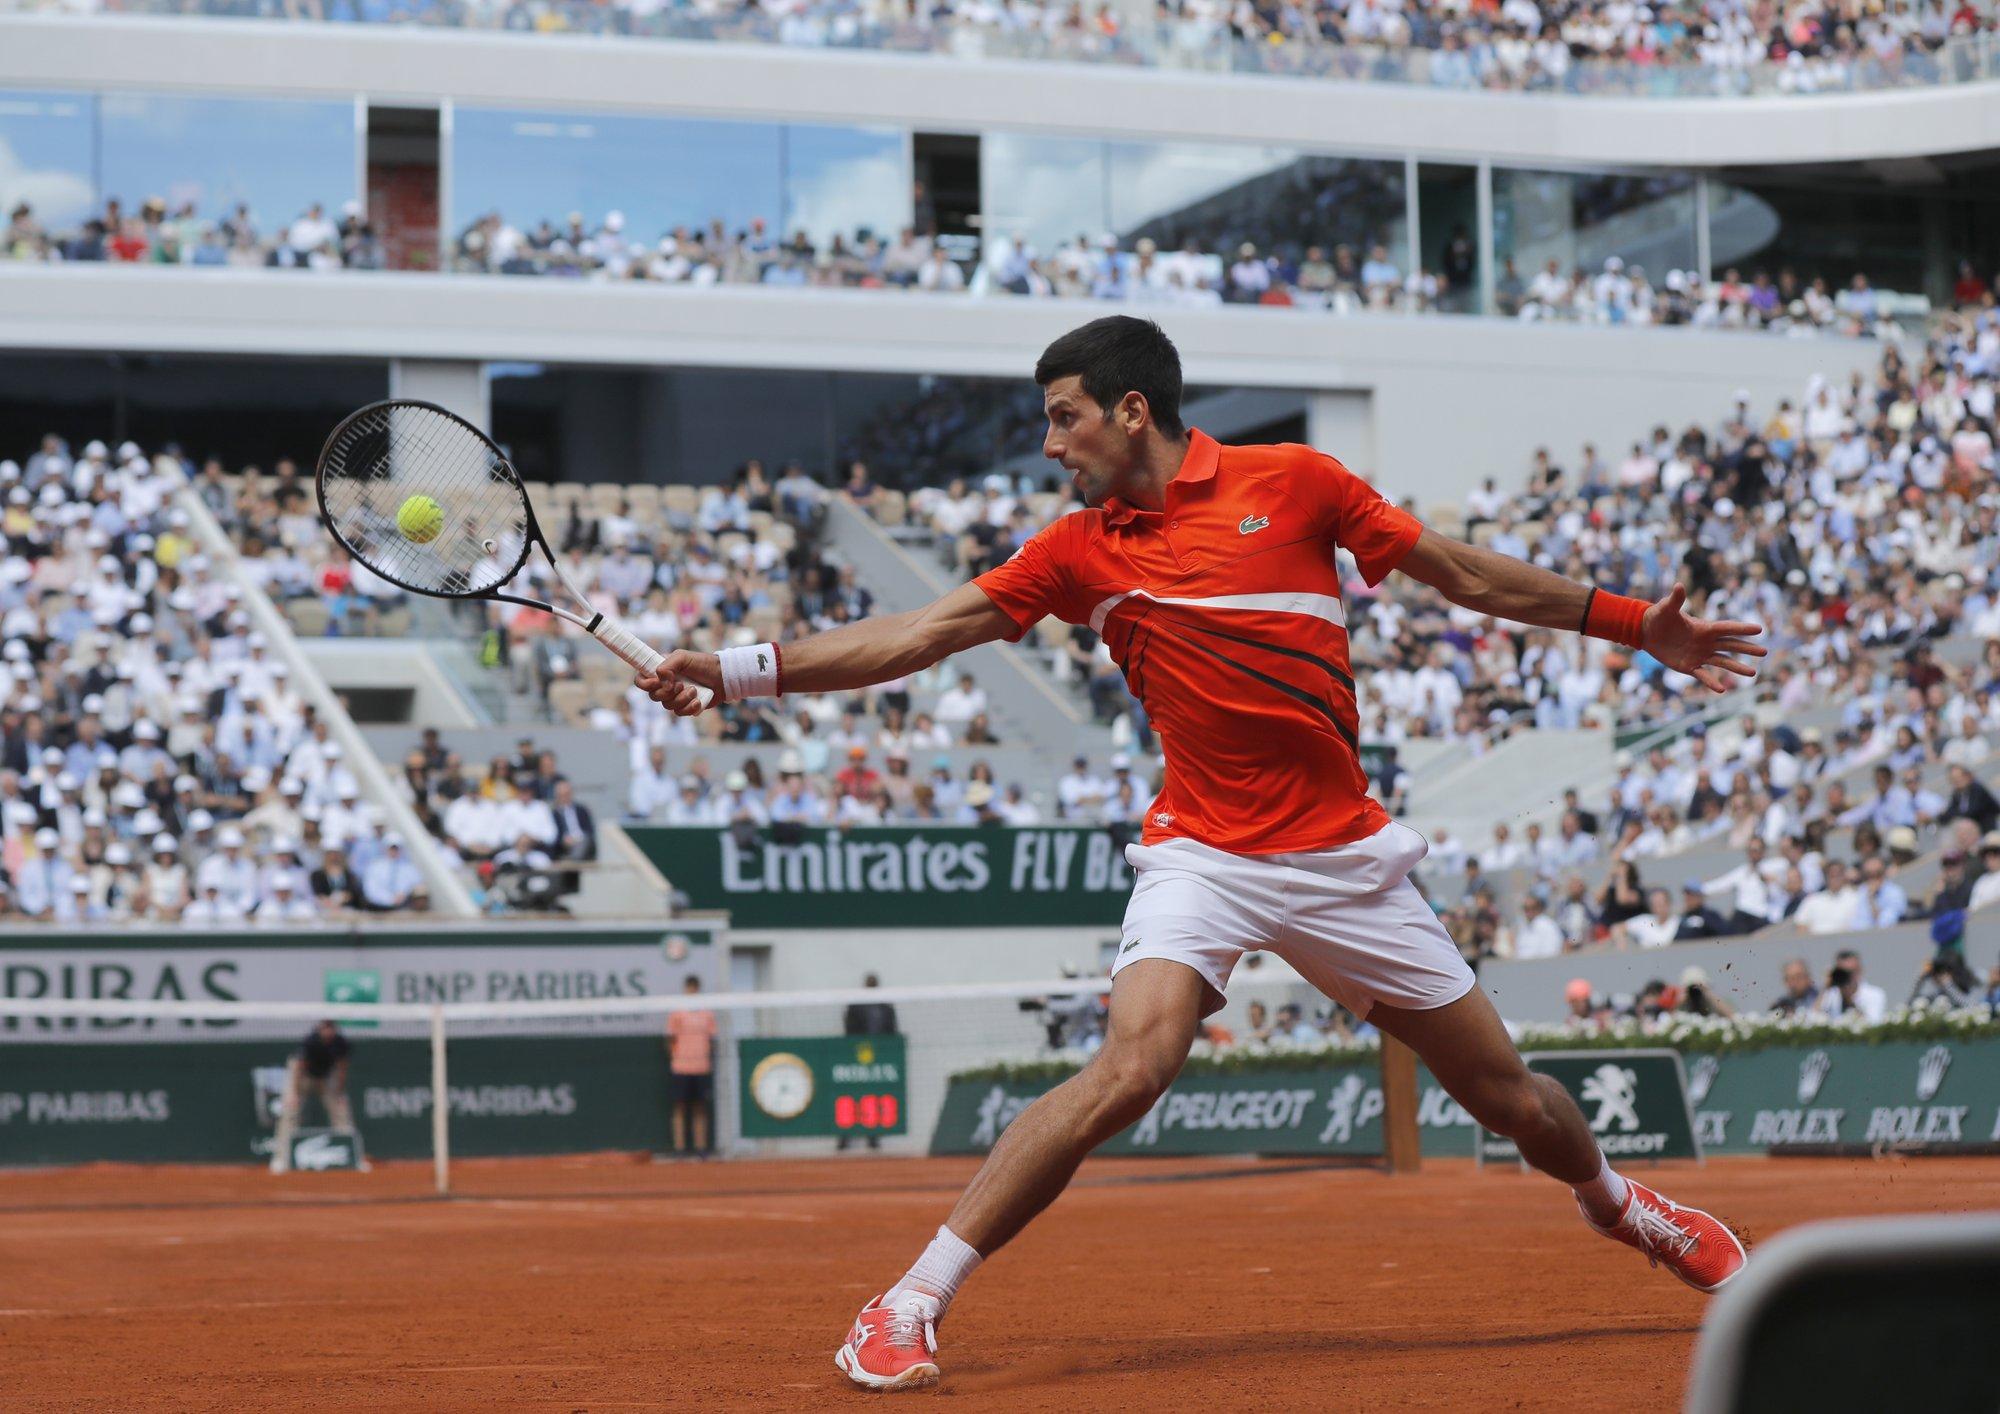 Djokovic reaches French Open semifinals